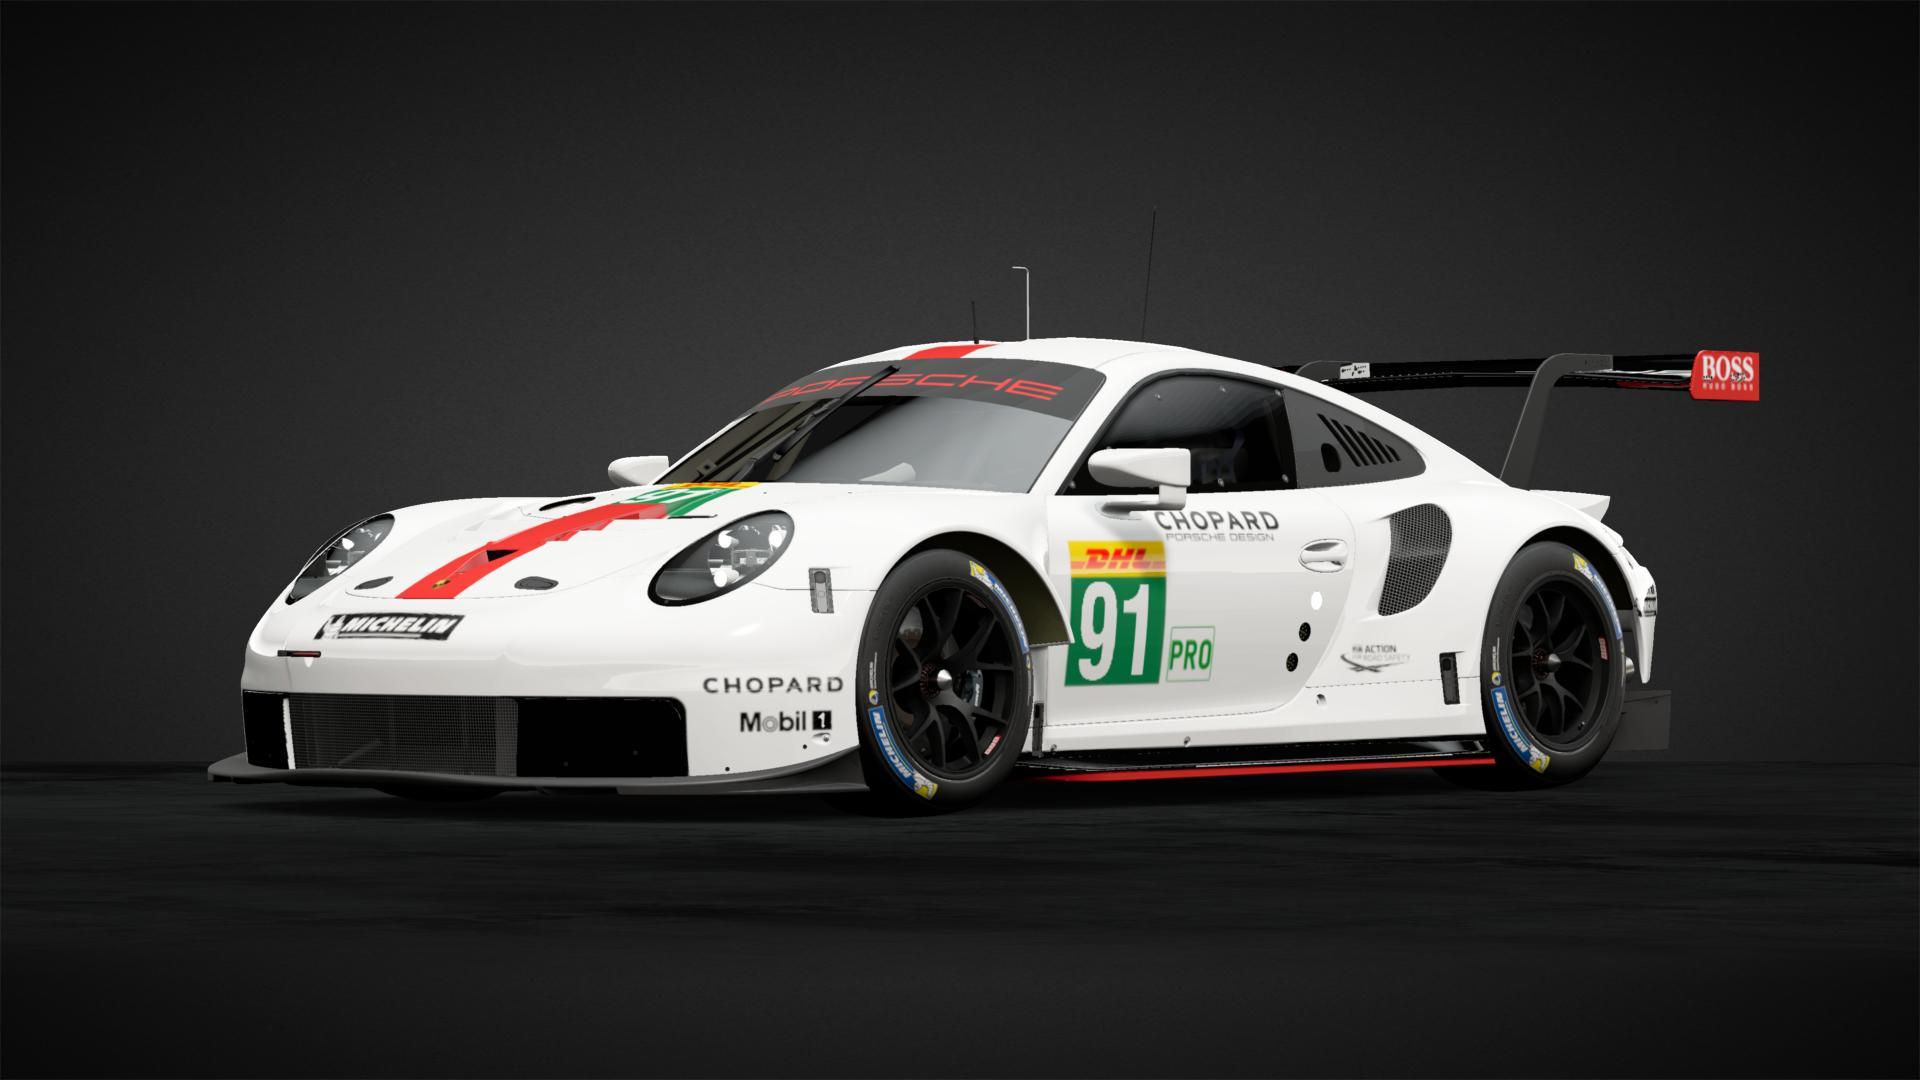 Обои Porsche 911, bmw m3 gts, mclaren p1, corvette c7. Игры foto 12